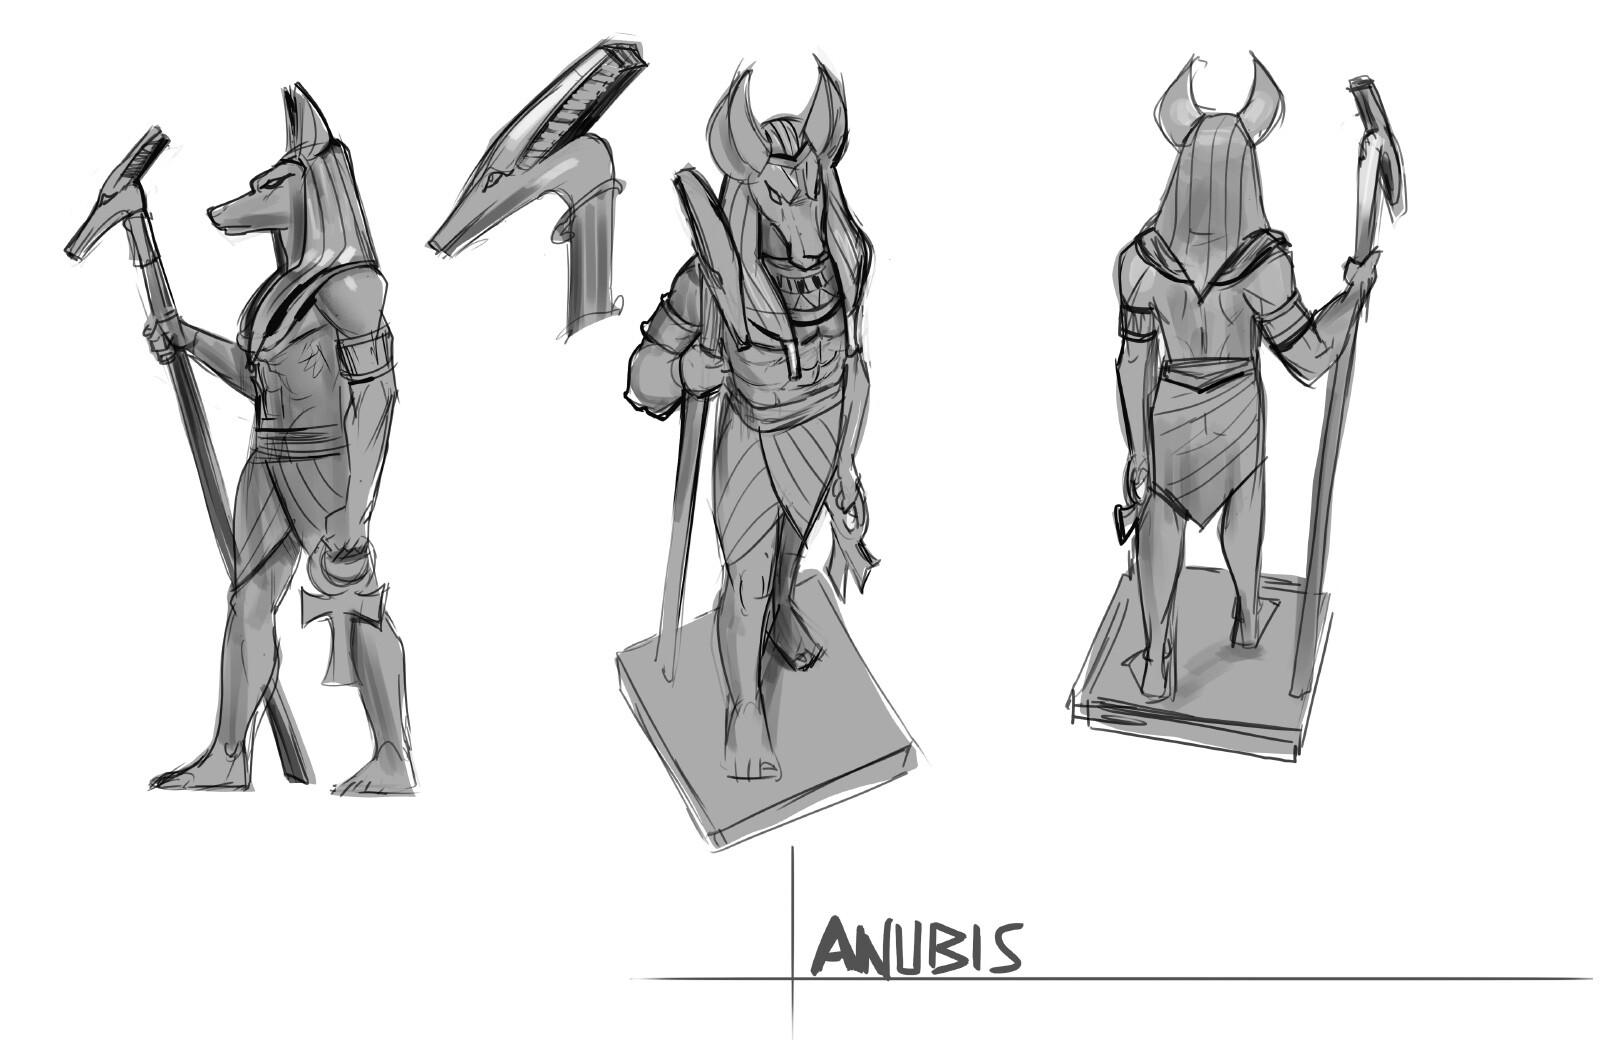 anubis figure concept